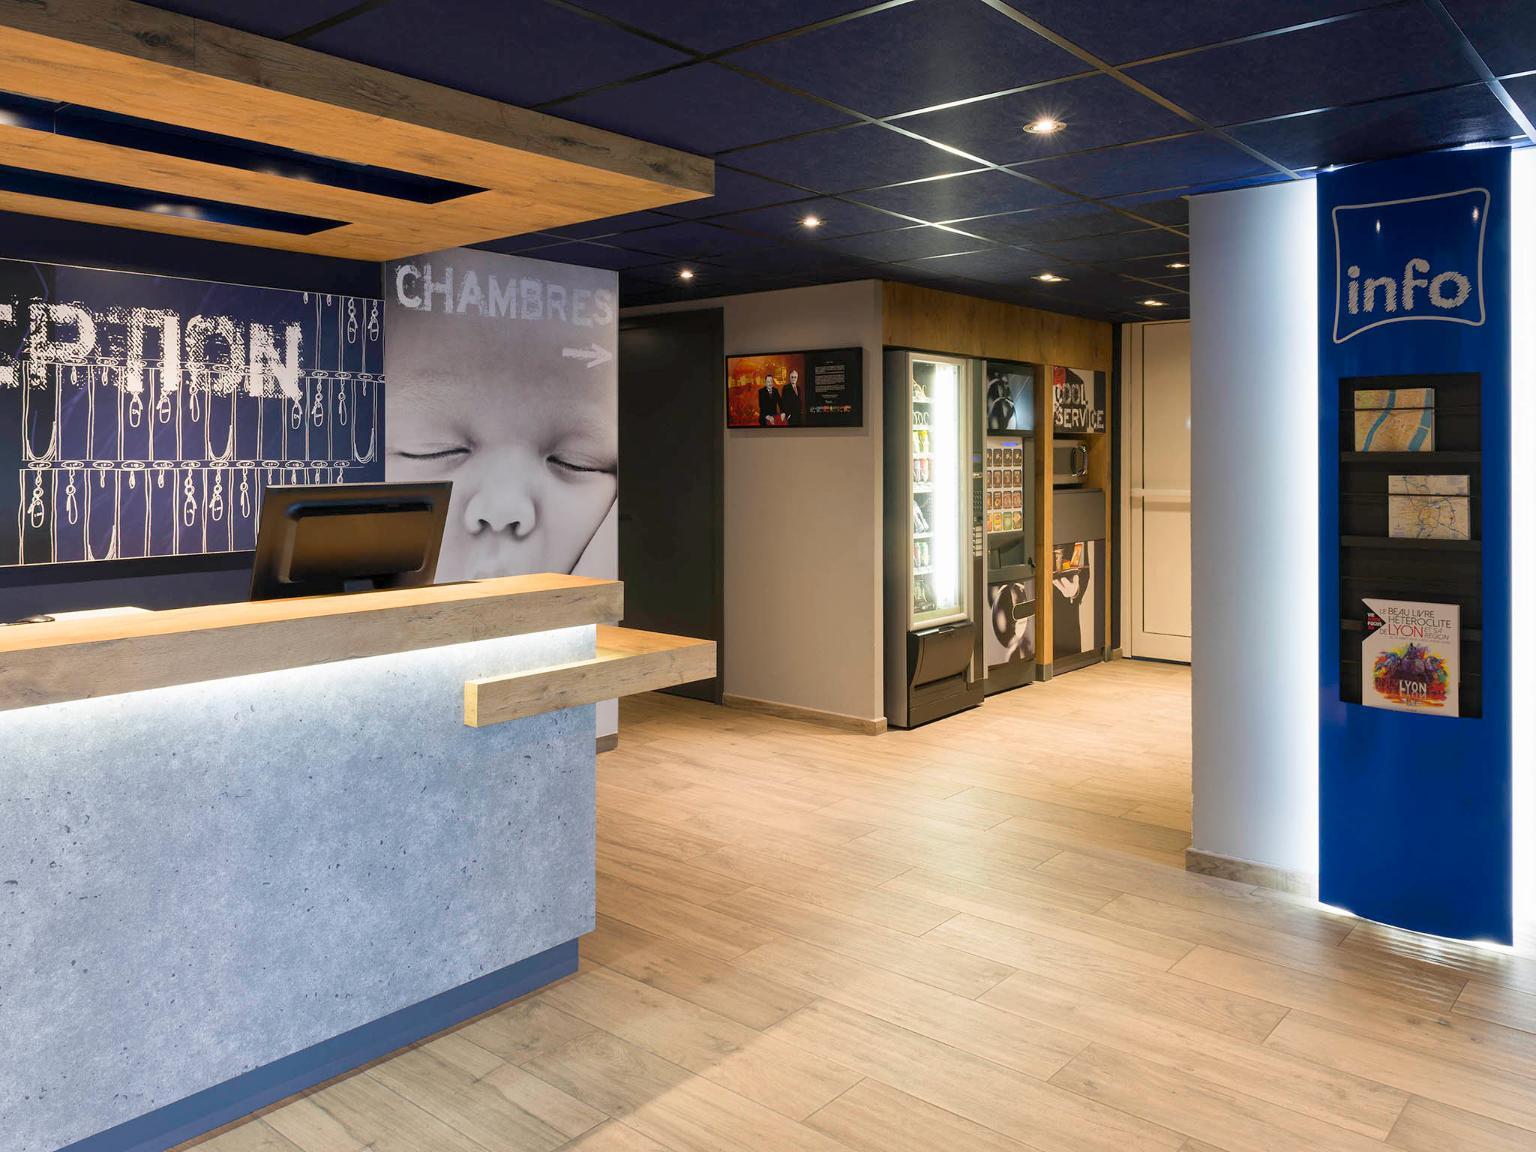 Ibis budget lyon confluence h tel 24 quai perrache for Hotels 69002 lyon